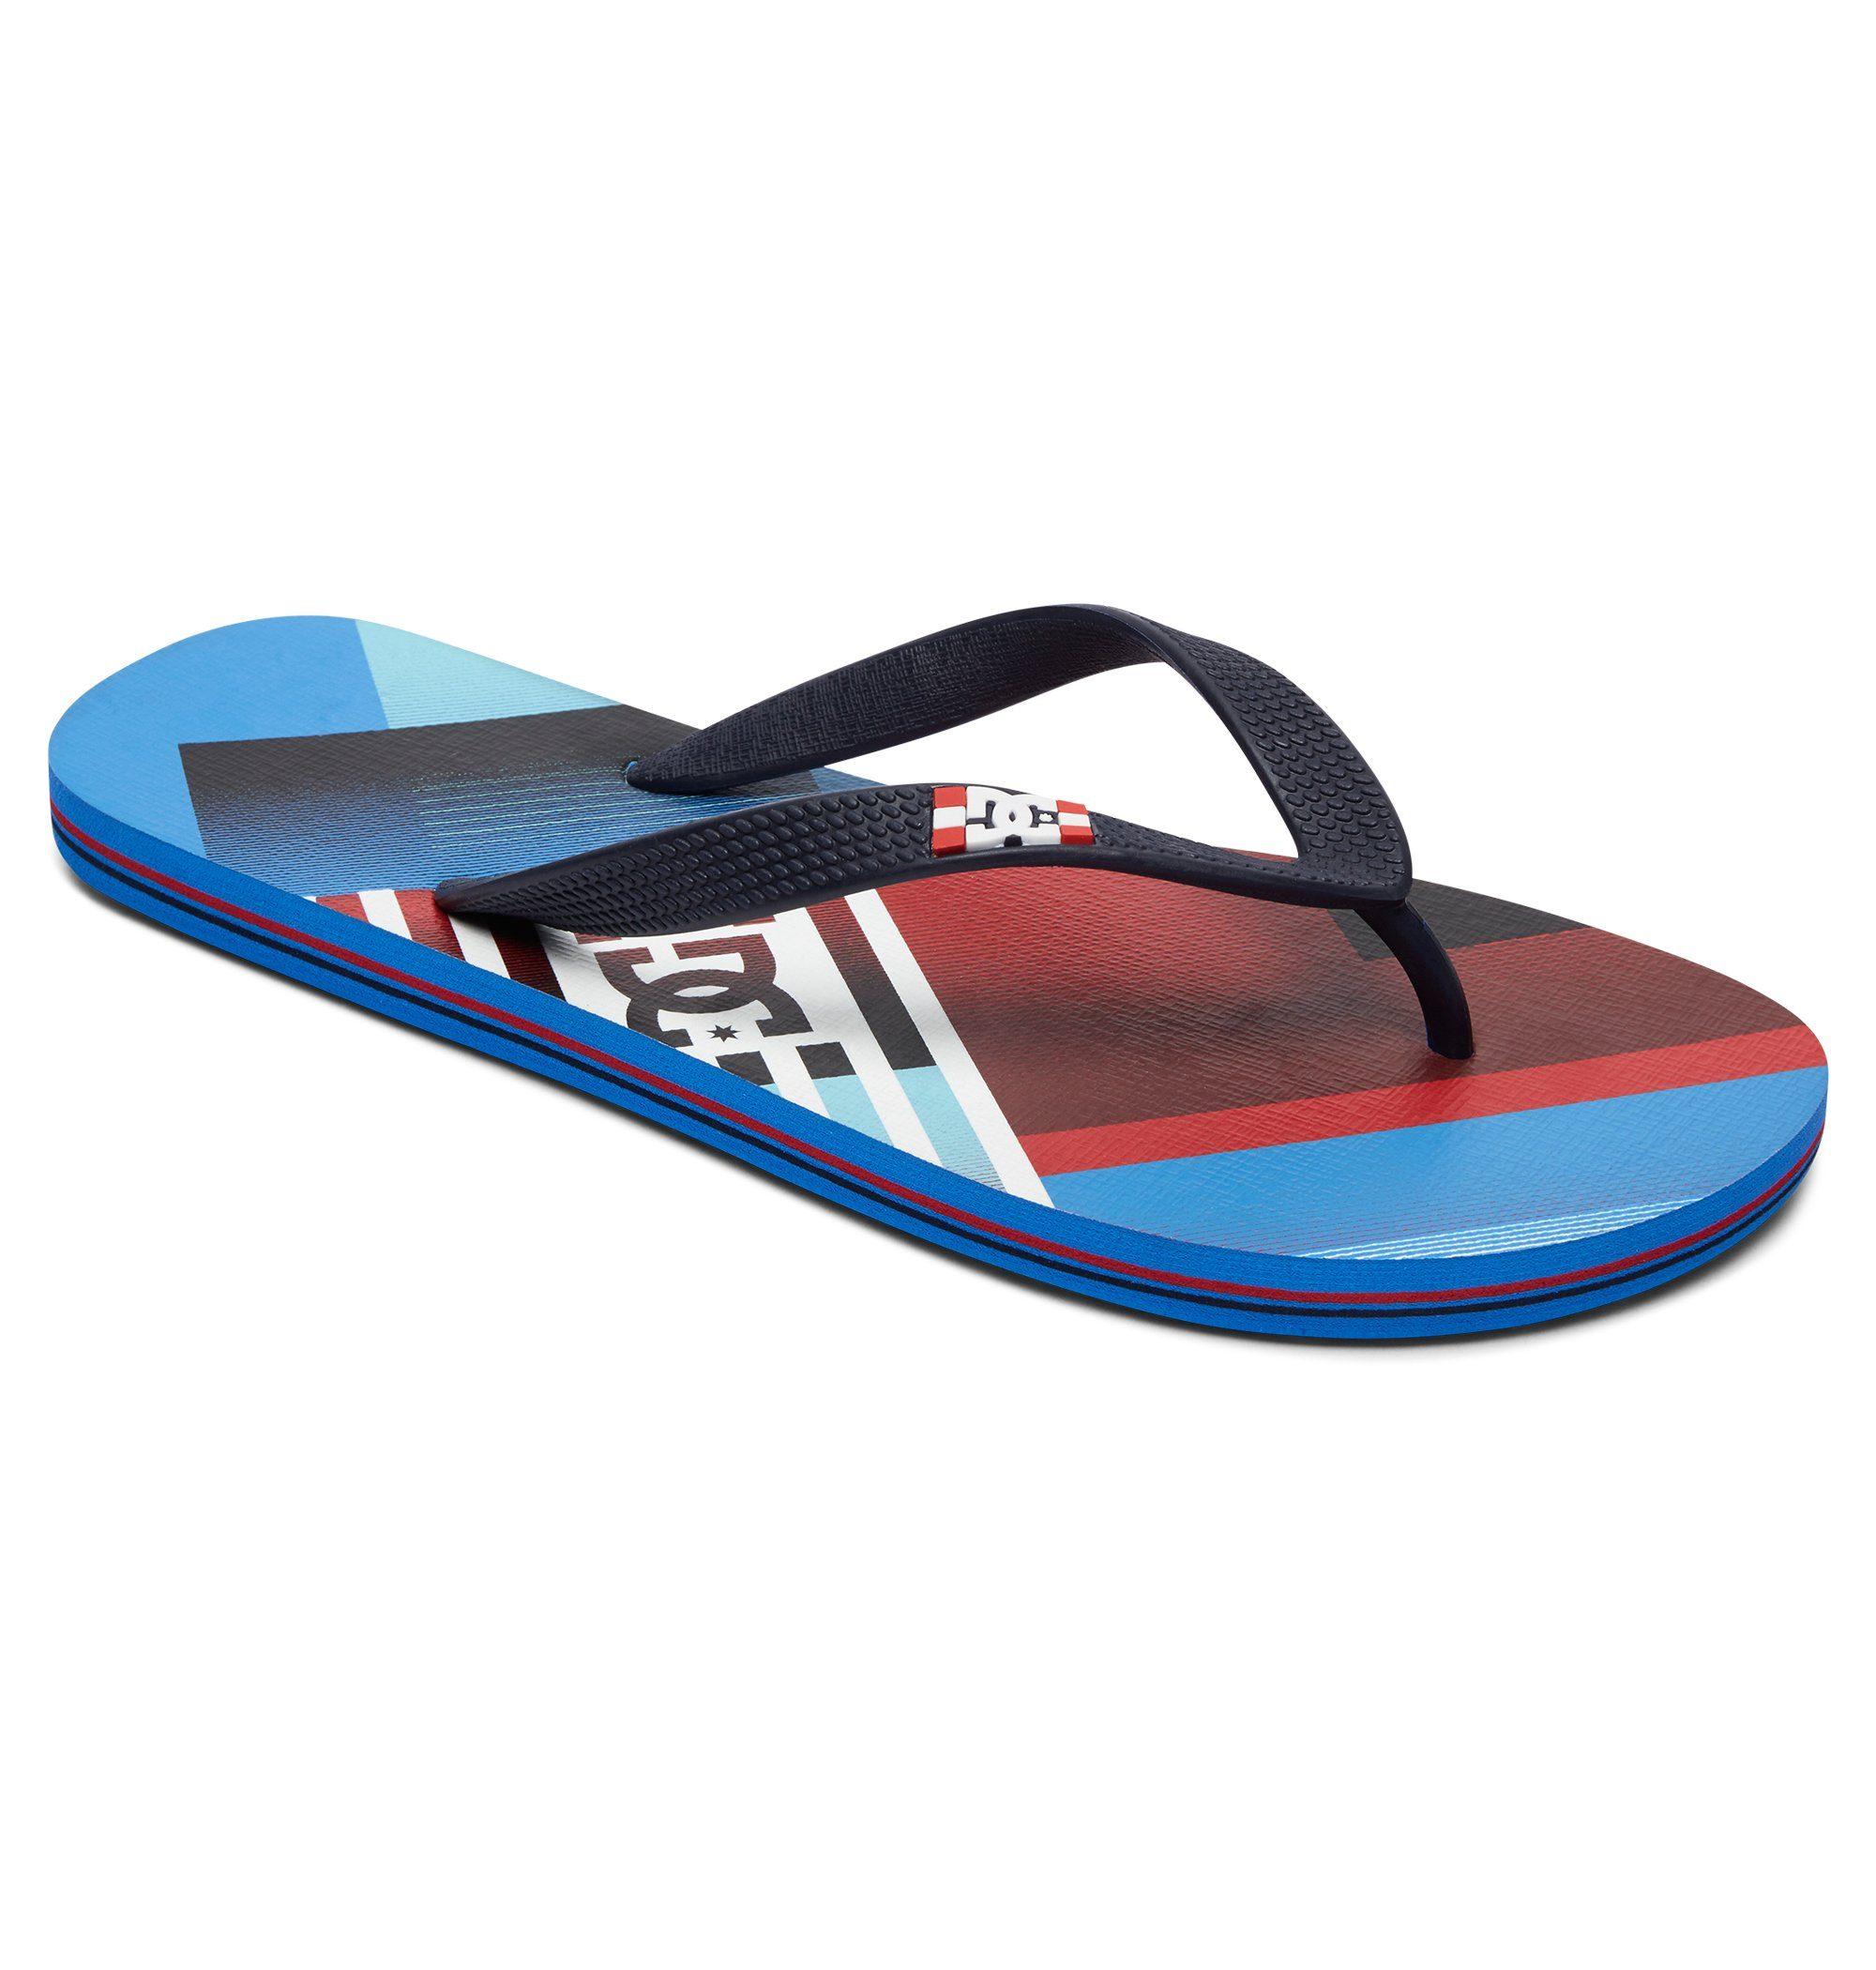 DC Shoes Sandalen Spray Graffik online kaufen  Blue#ft5_slash#red